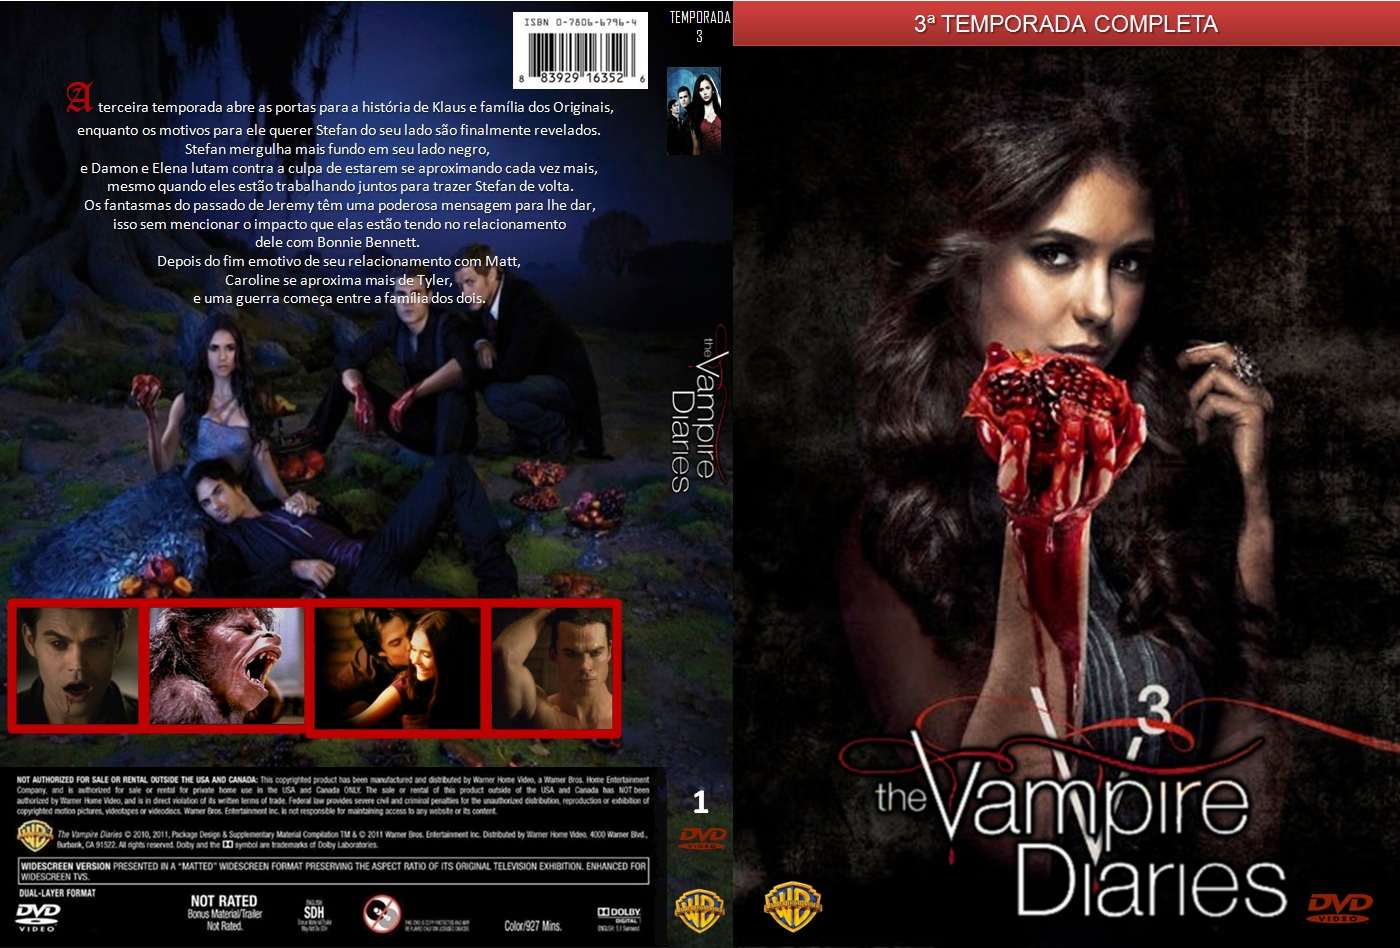 http://1.bp.blogspot.com/-lYPVjHC88Wc/TzrWOb7UlKI/AAAAAAAAA5U/YDTP0cjCPsU/s1600/Diarios+de+um+vampiro+3+temporada+Capa+01.jpg